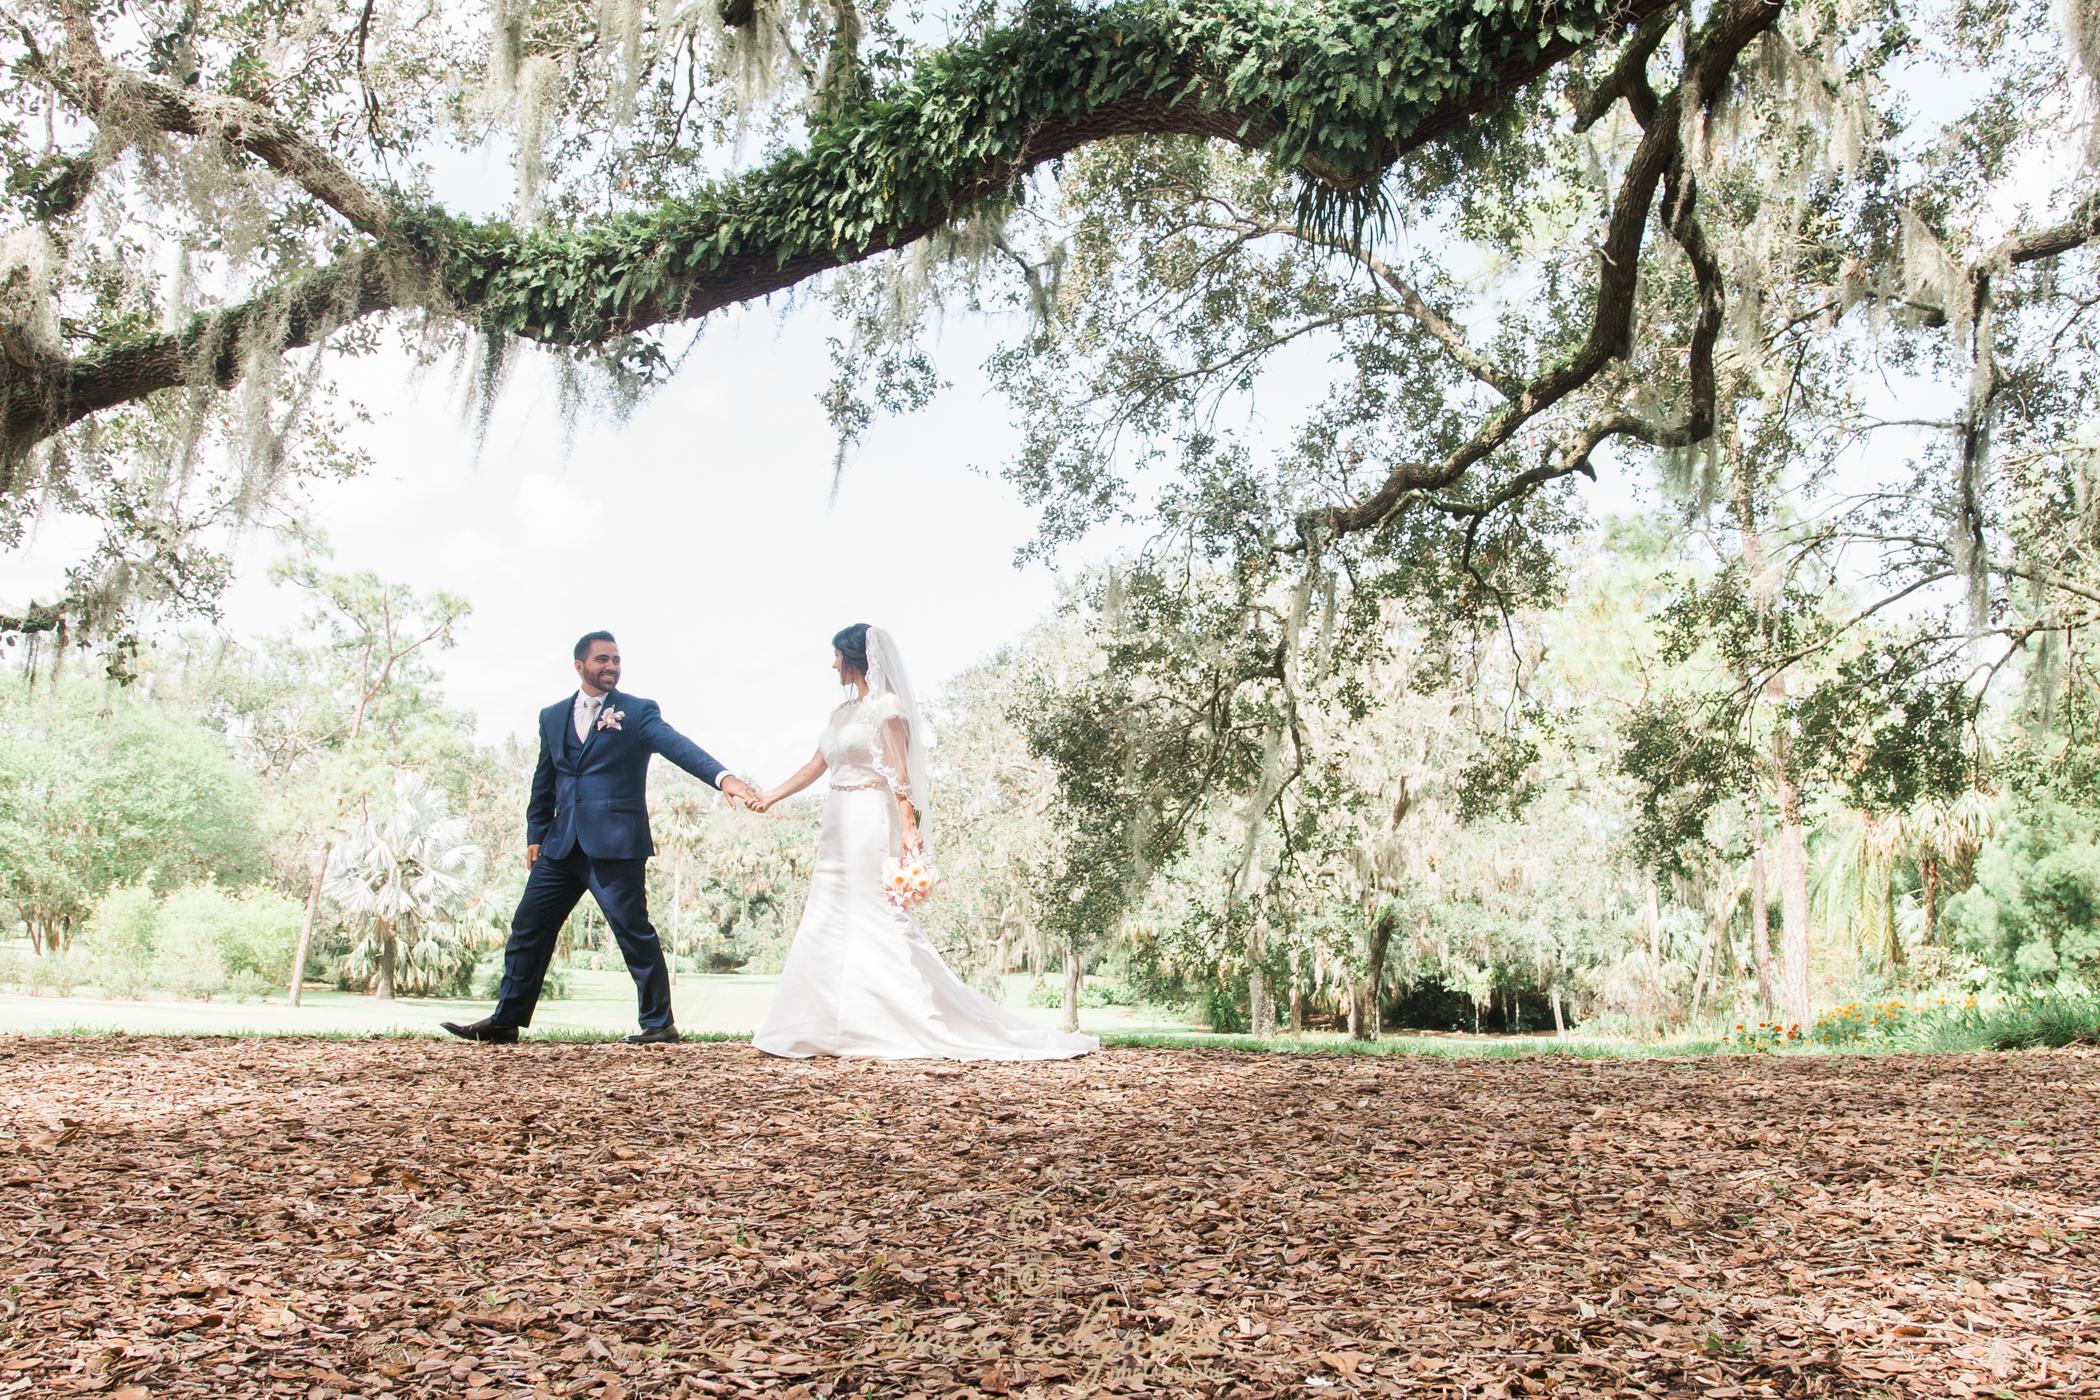 Bok-tower-gardens-wedding-photo, bride-and-groom-portrait, Beautiful-garden-wedding-photo